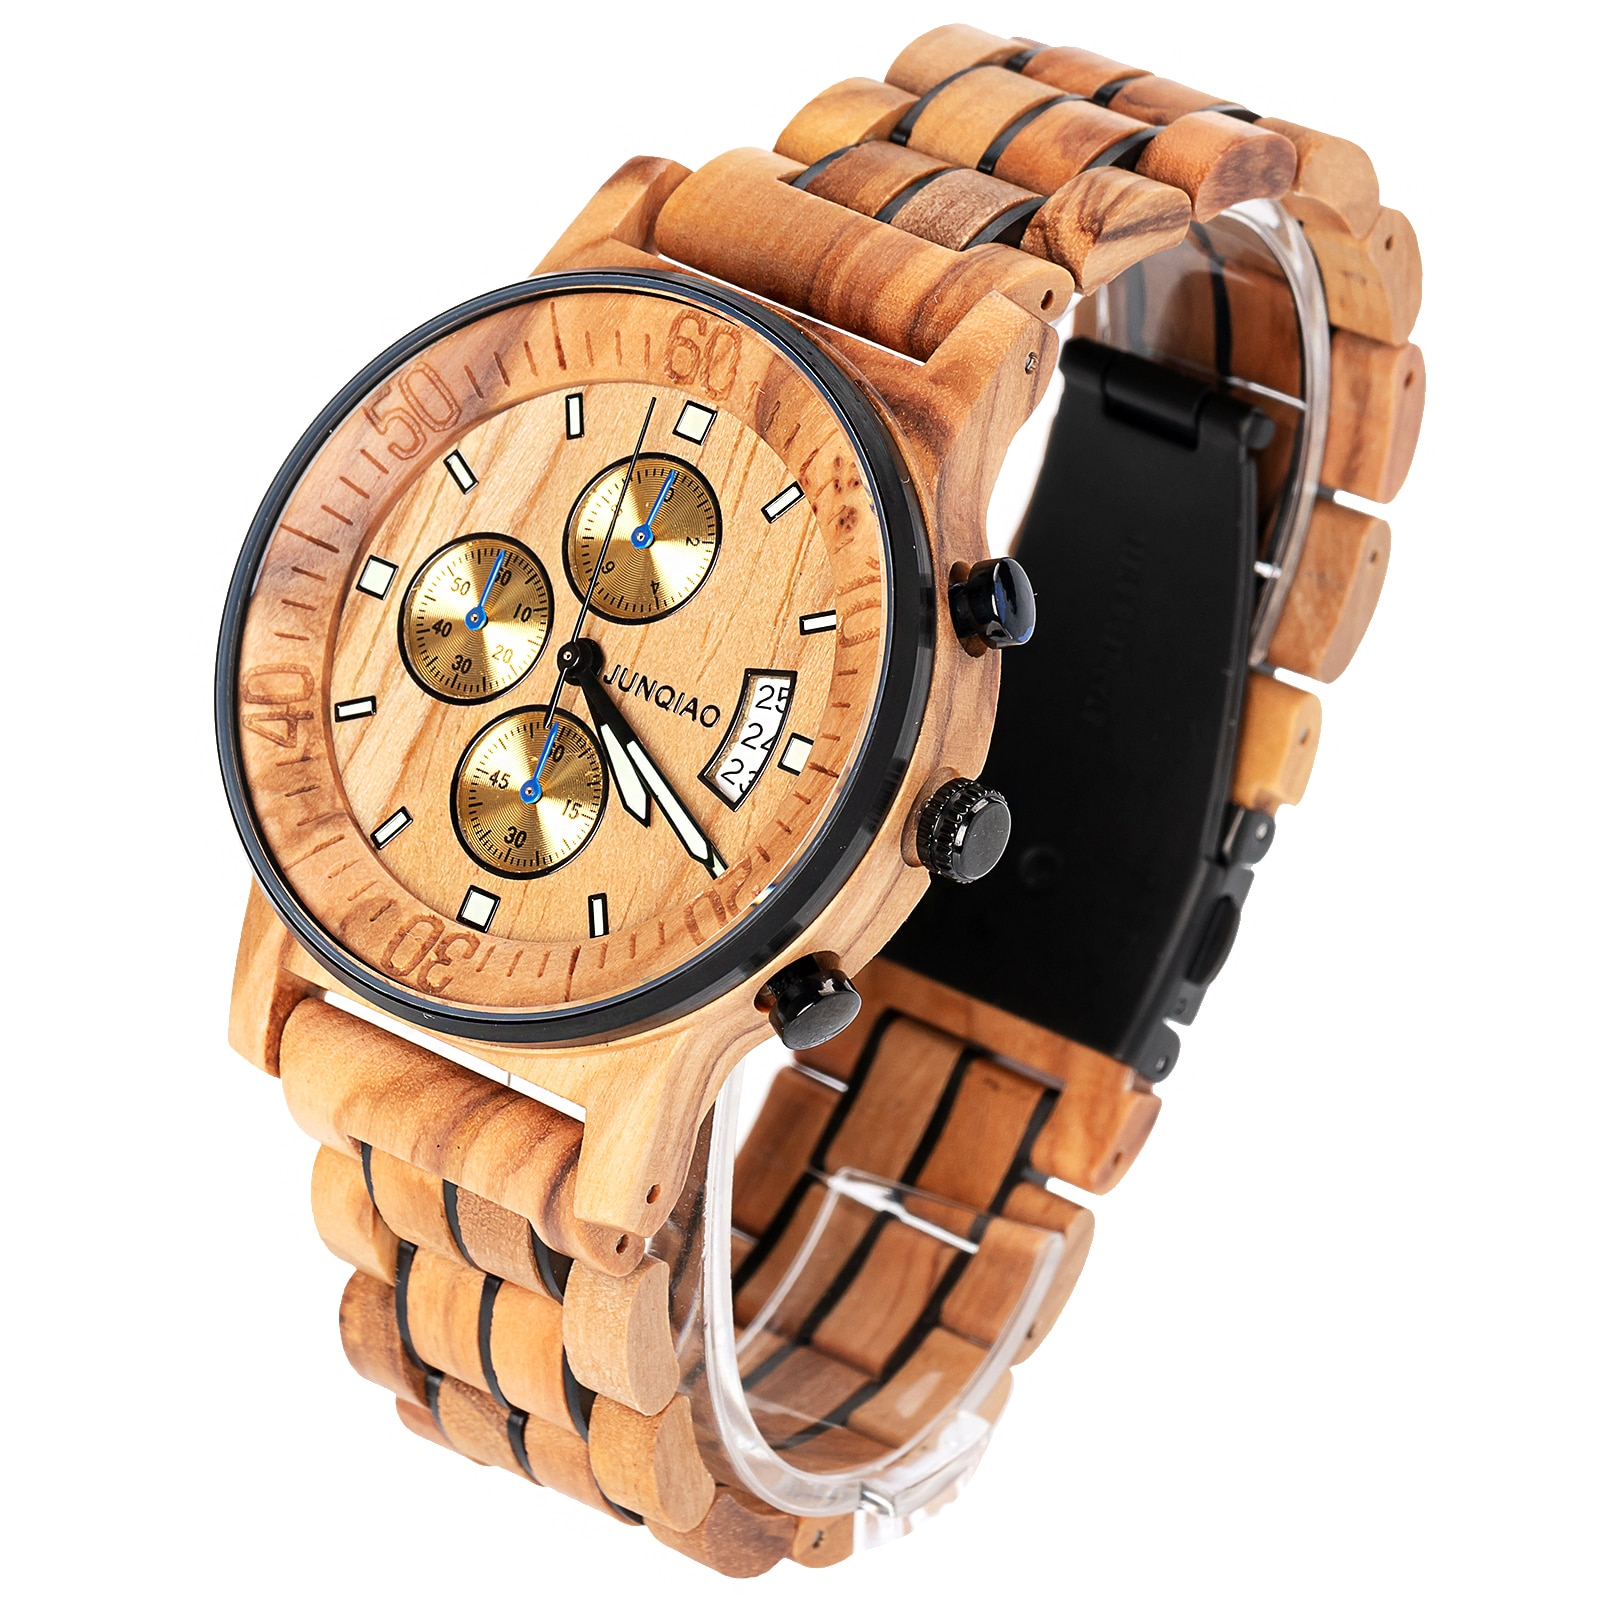 wood watch wrist watches men Quartz Wristwatch Chronograph Clock Male Fashion Sports men watches male hardlex Relogio Masculino